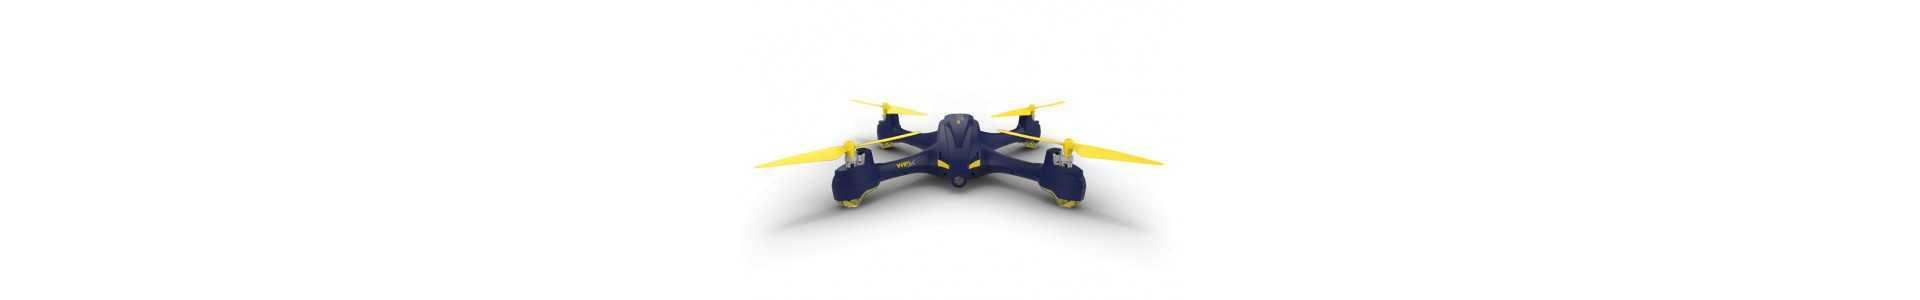 Hubsan X4 Star Pro - H507A